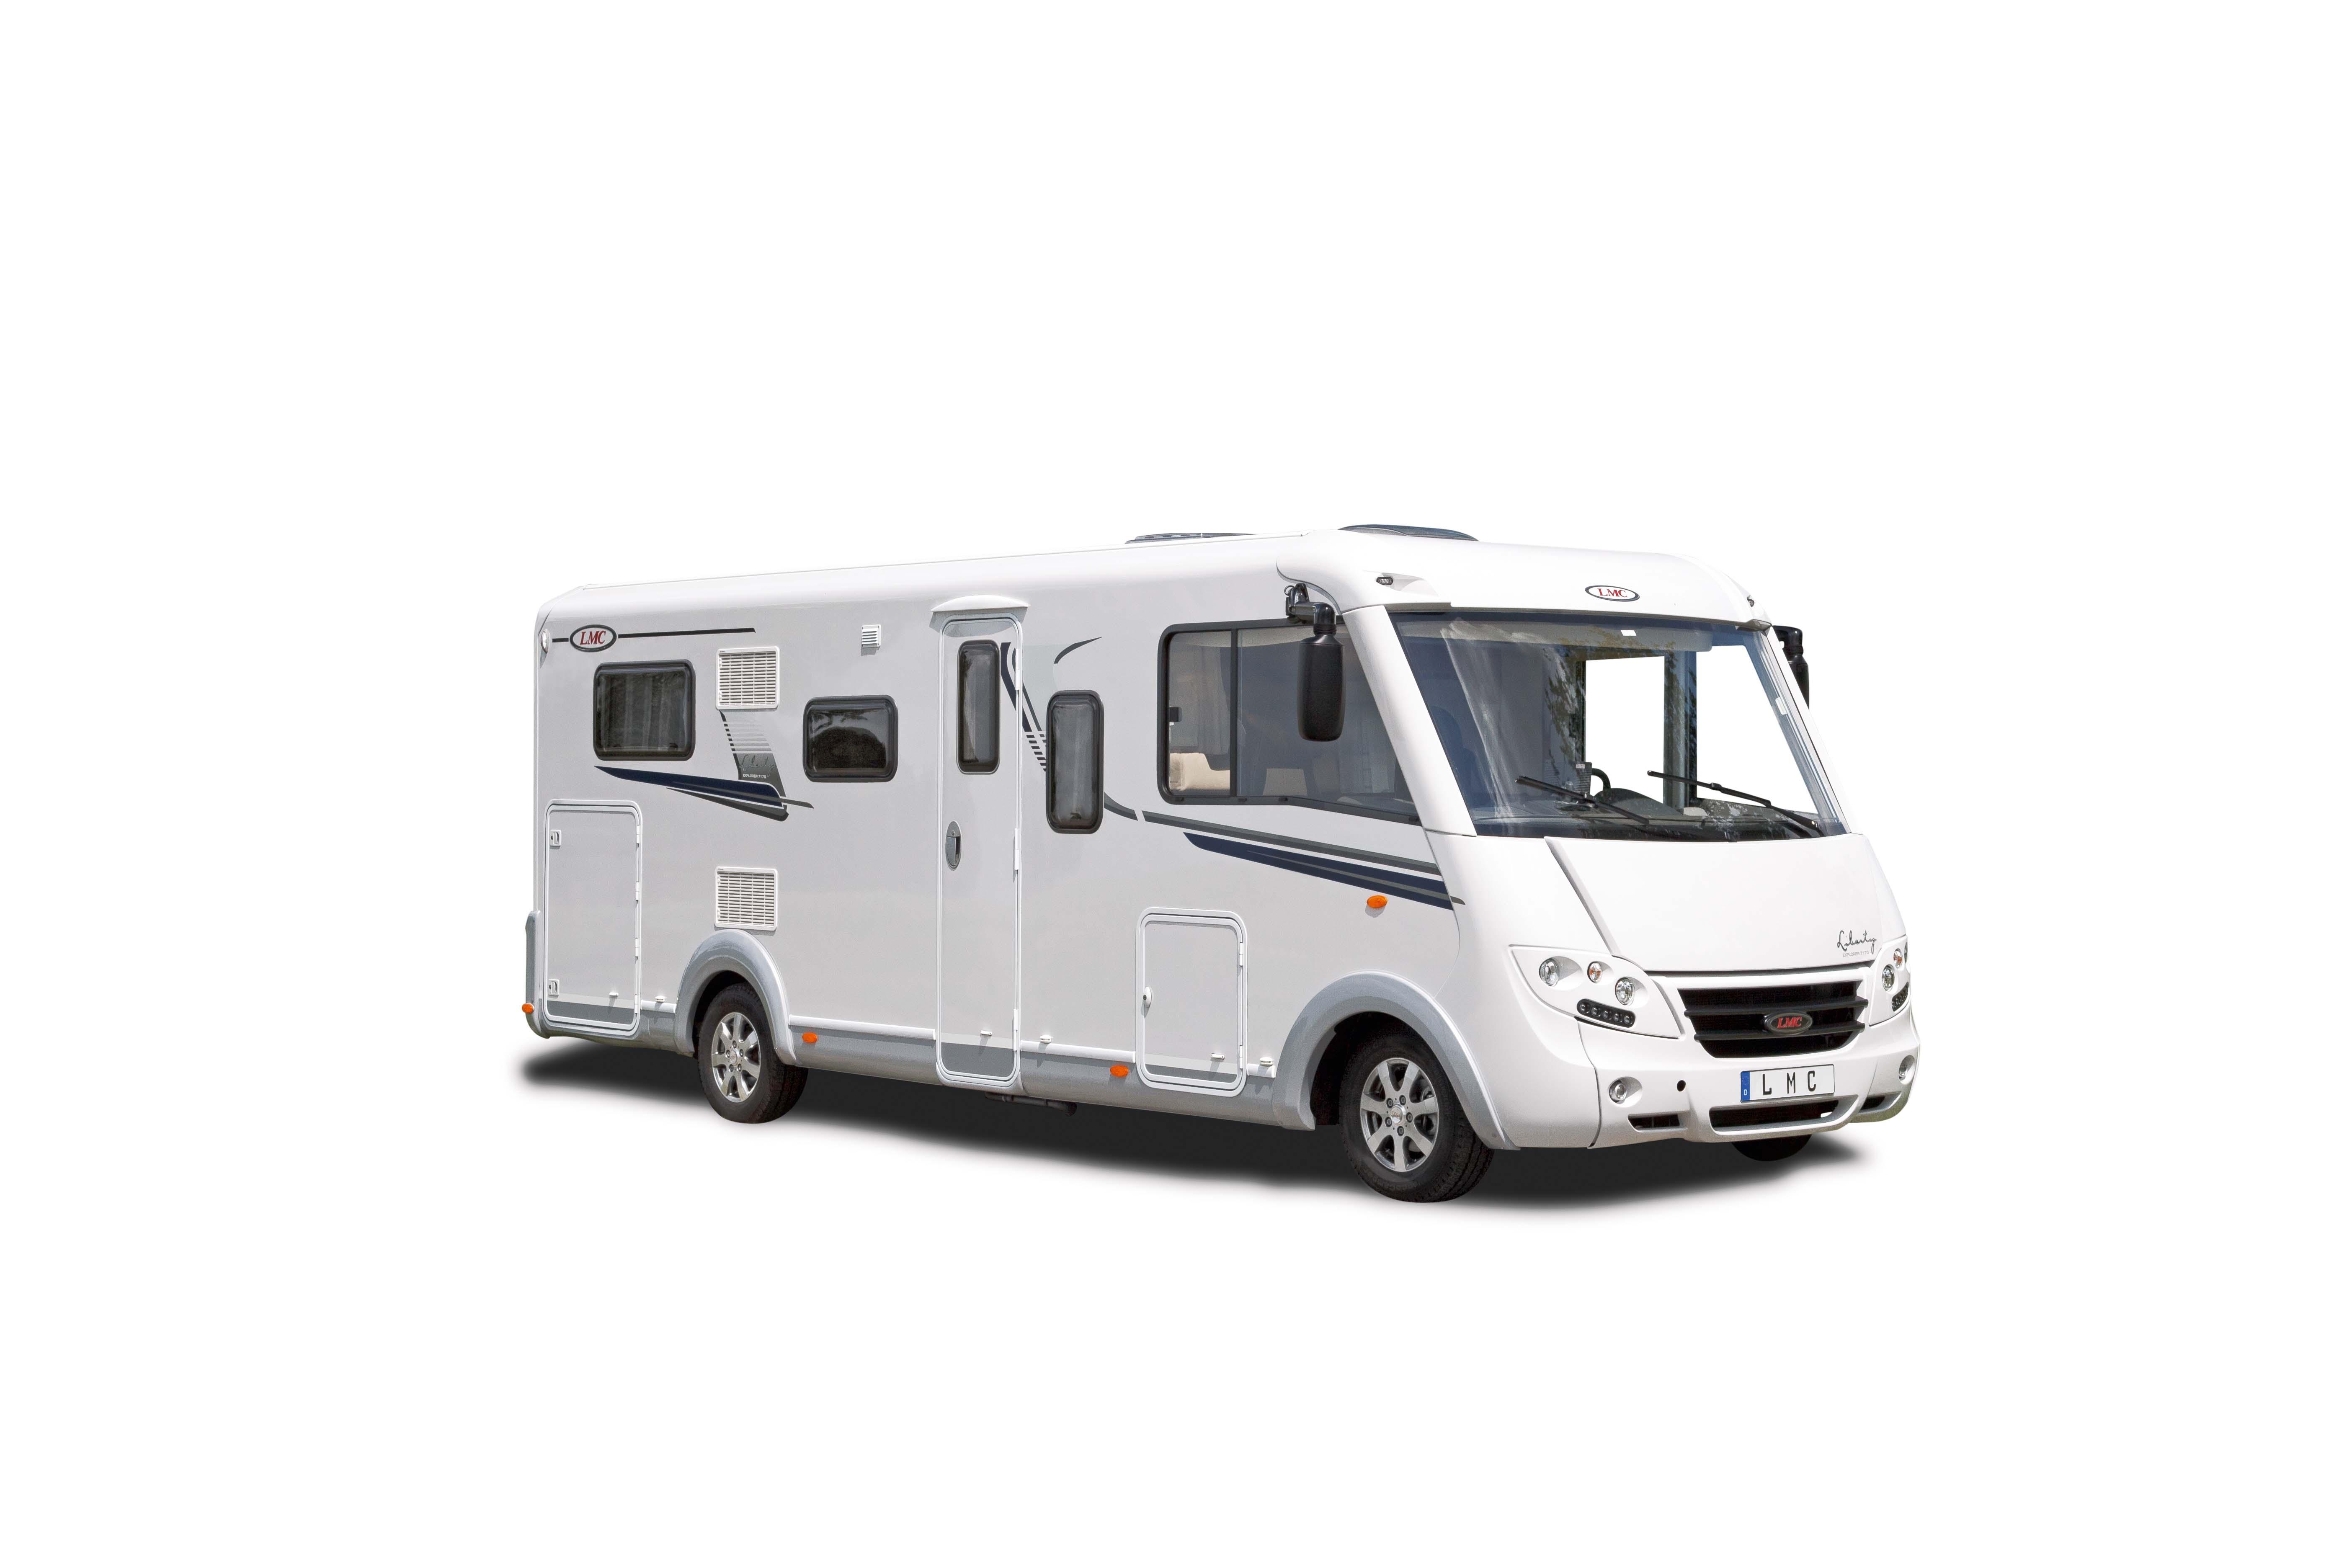 2012_reisemobile_explorer_i_110245_LMC